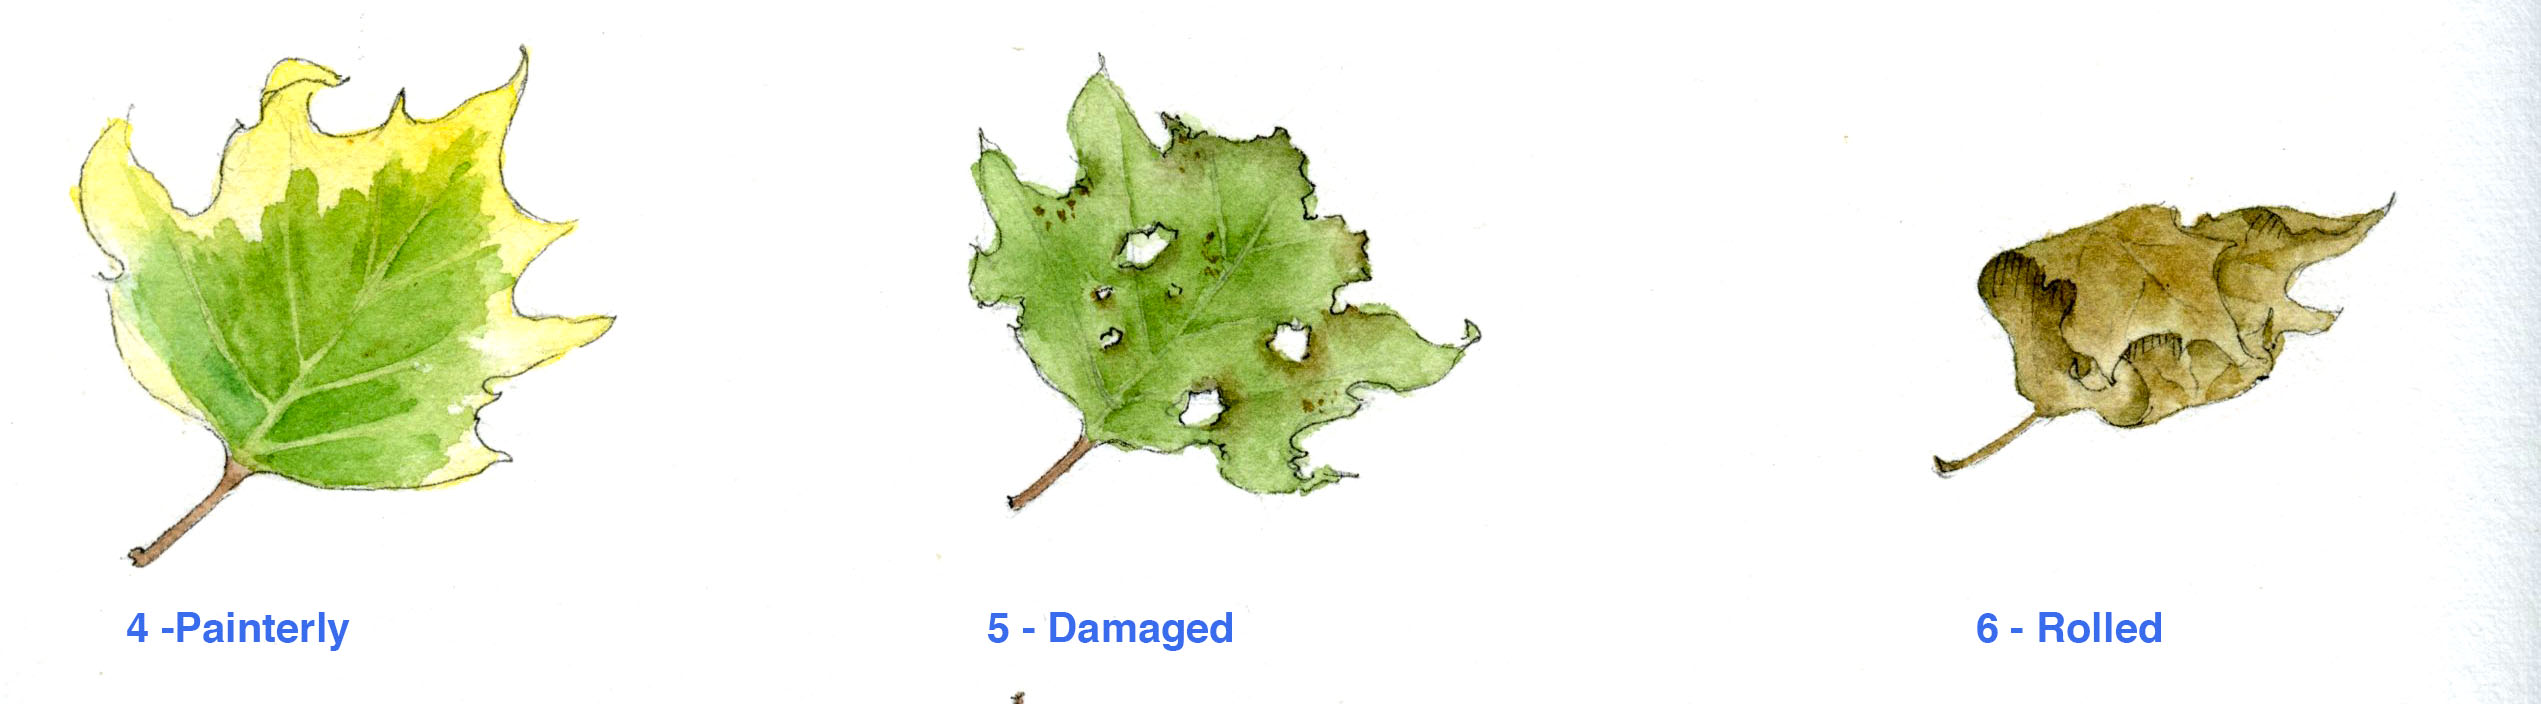 Painted maple leaves